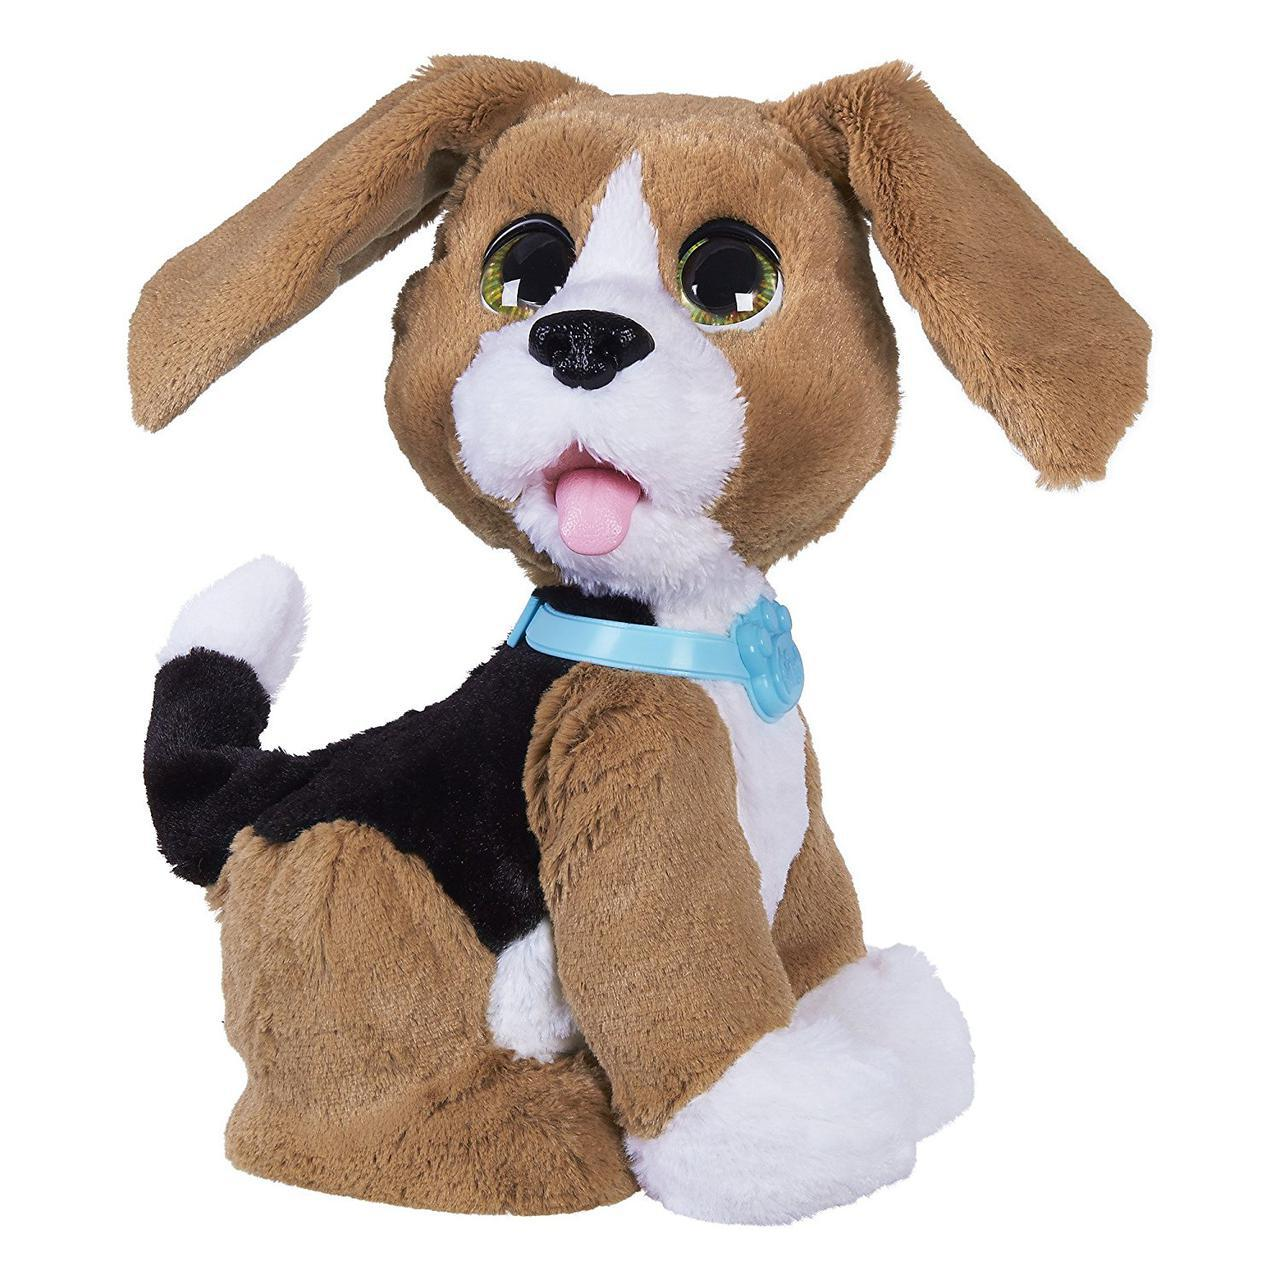 Говорящий щенок Чарли FurReal Friends на английском языке / FurReal Chatty Charlie the Barkin' Beagle